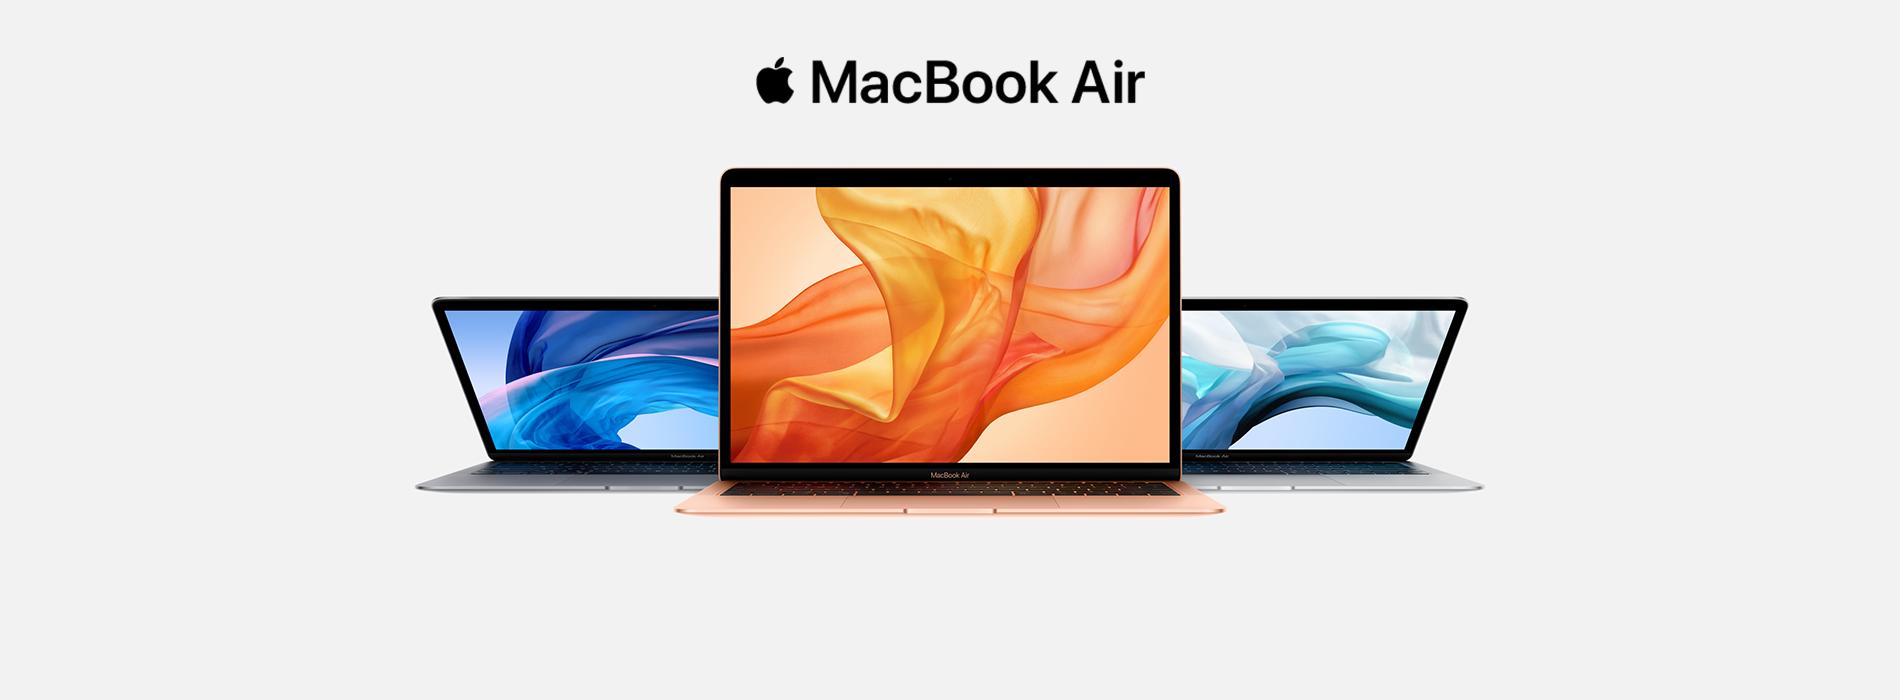 Category Mac - MacBook Air